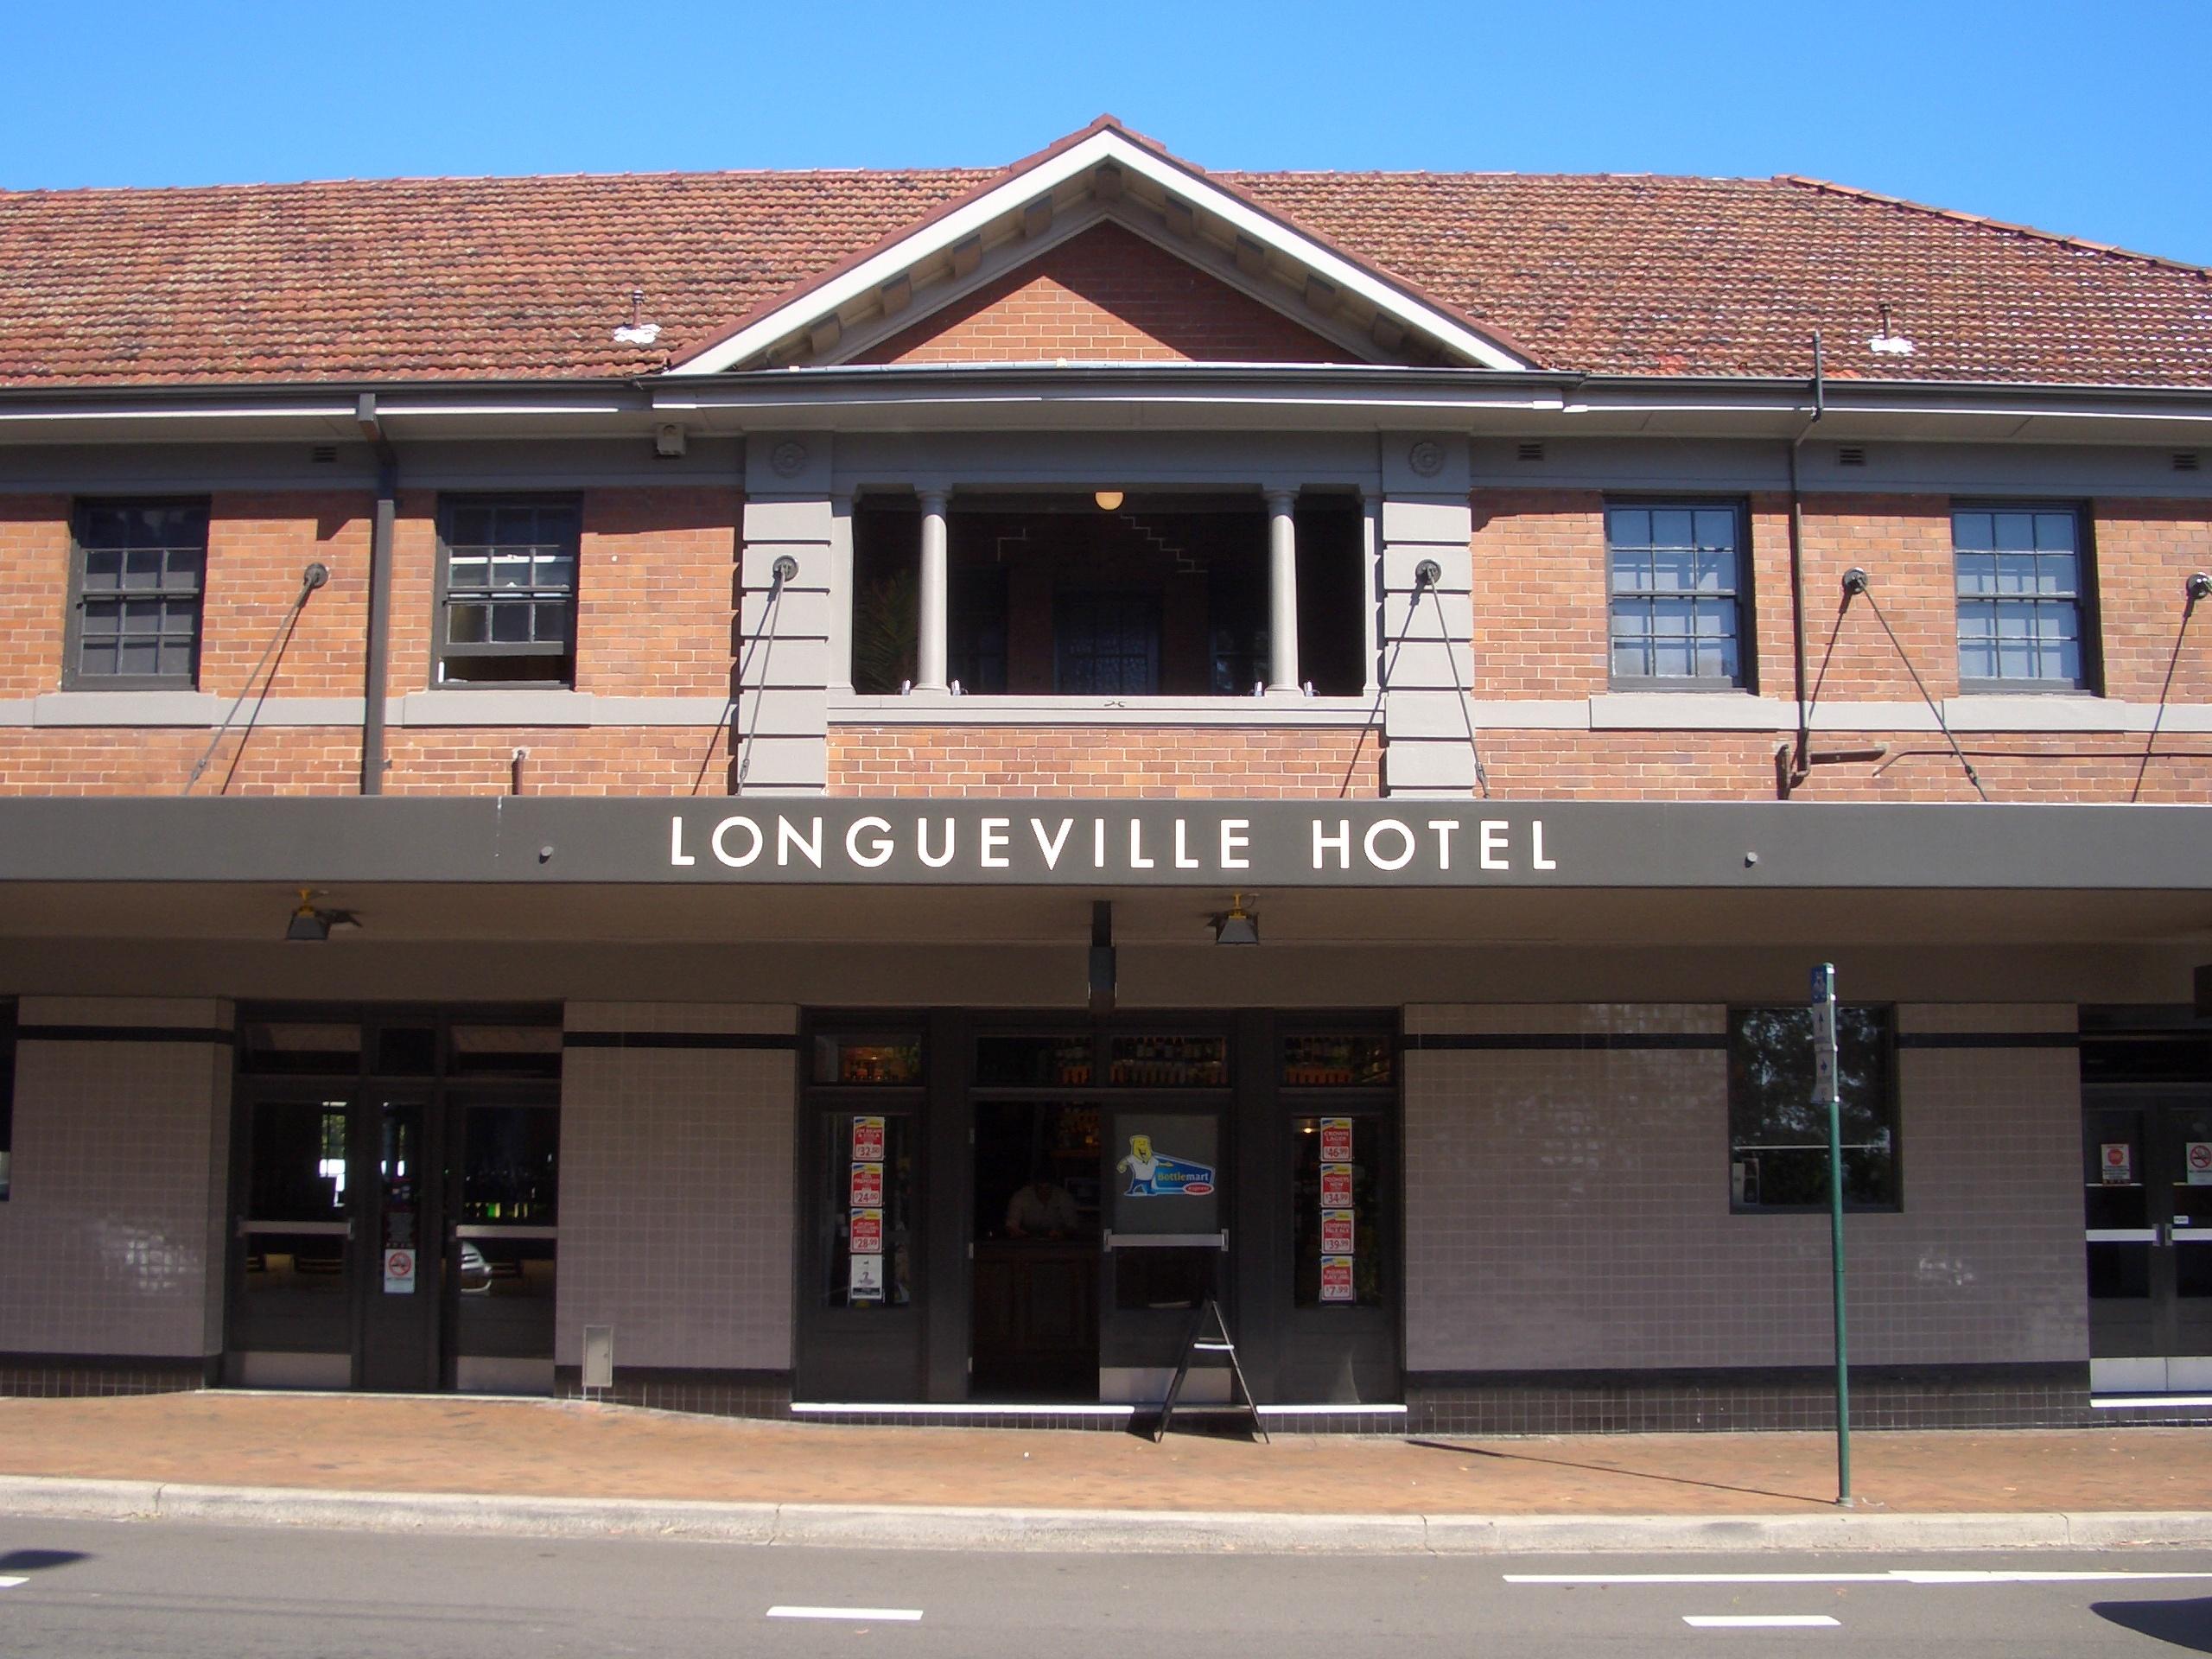 Lane_Cove_Longueville_Hotel